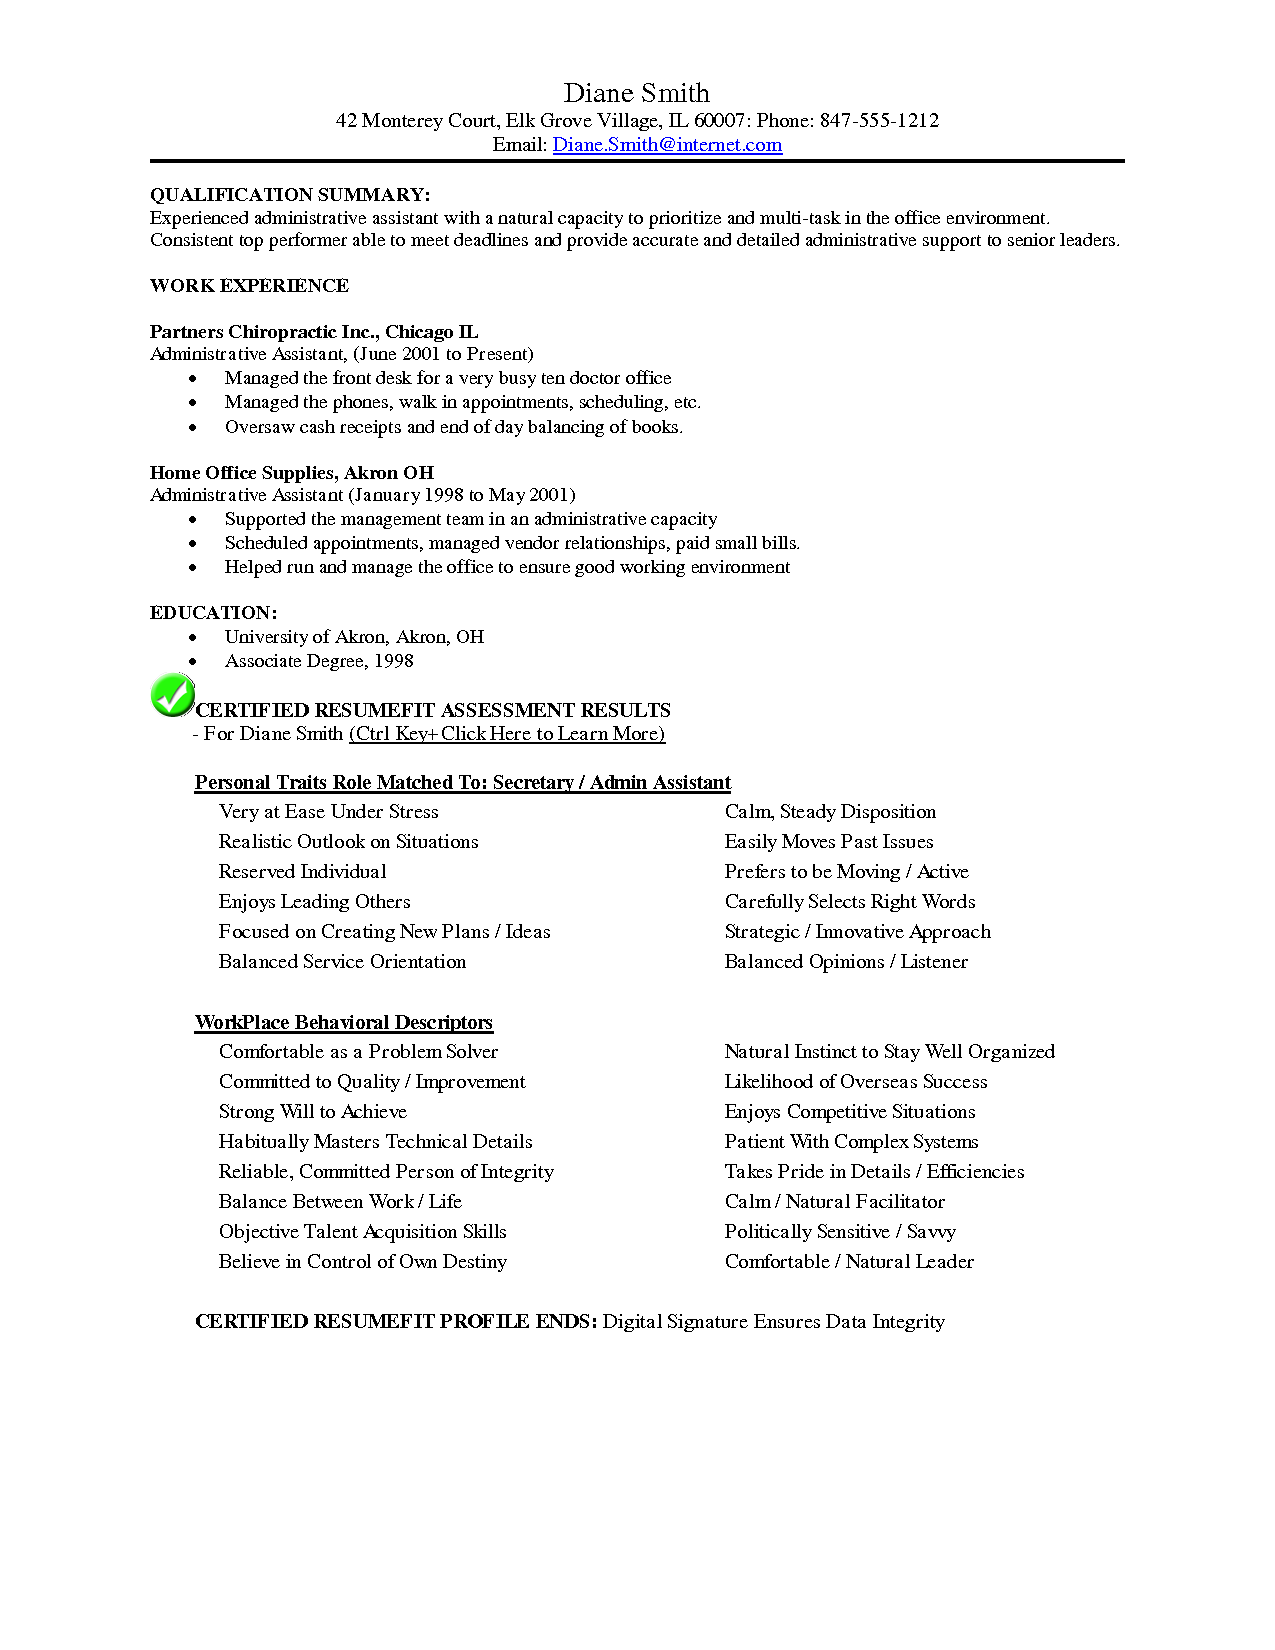 doctor of chiropractic resume sample